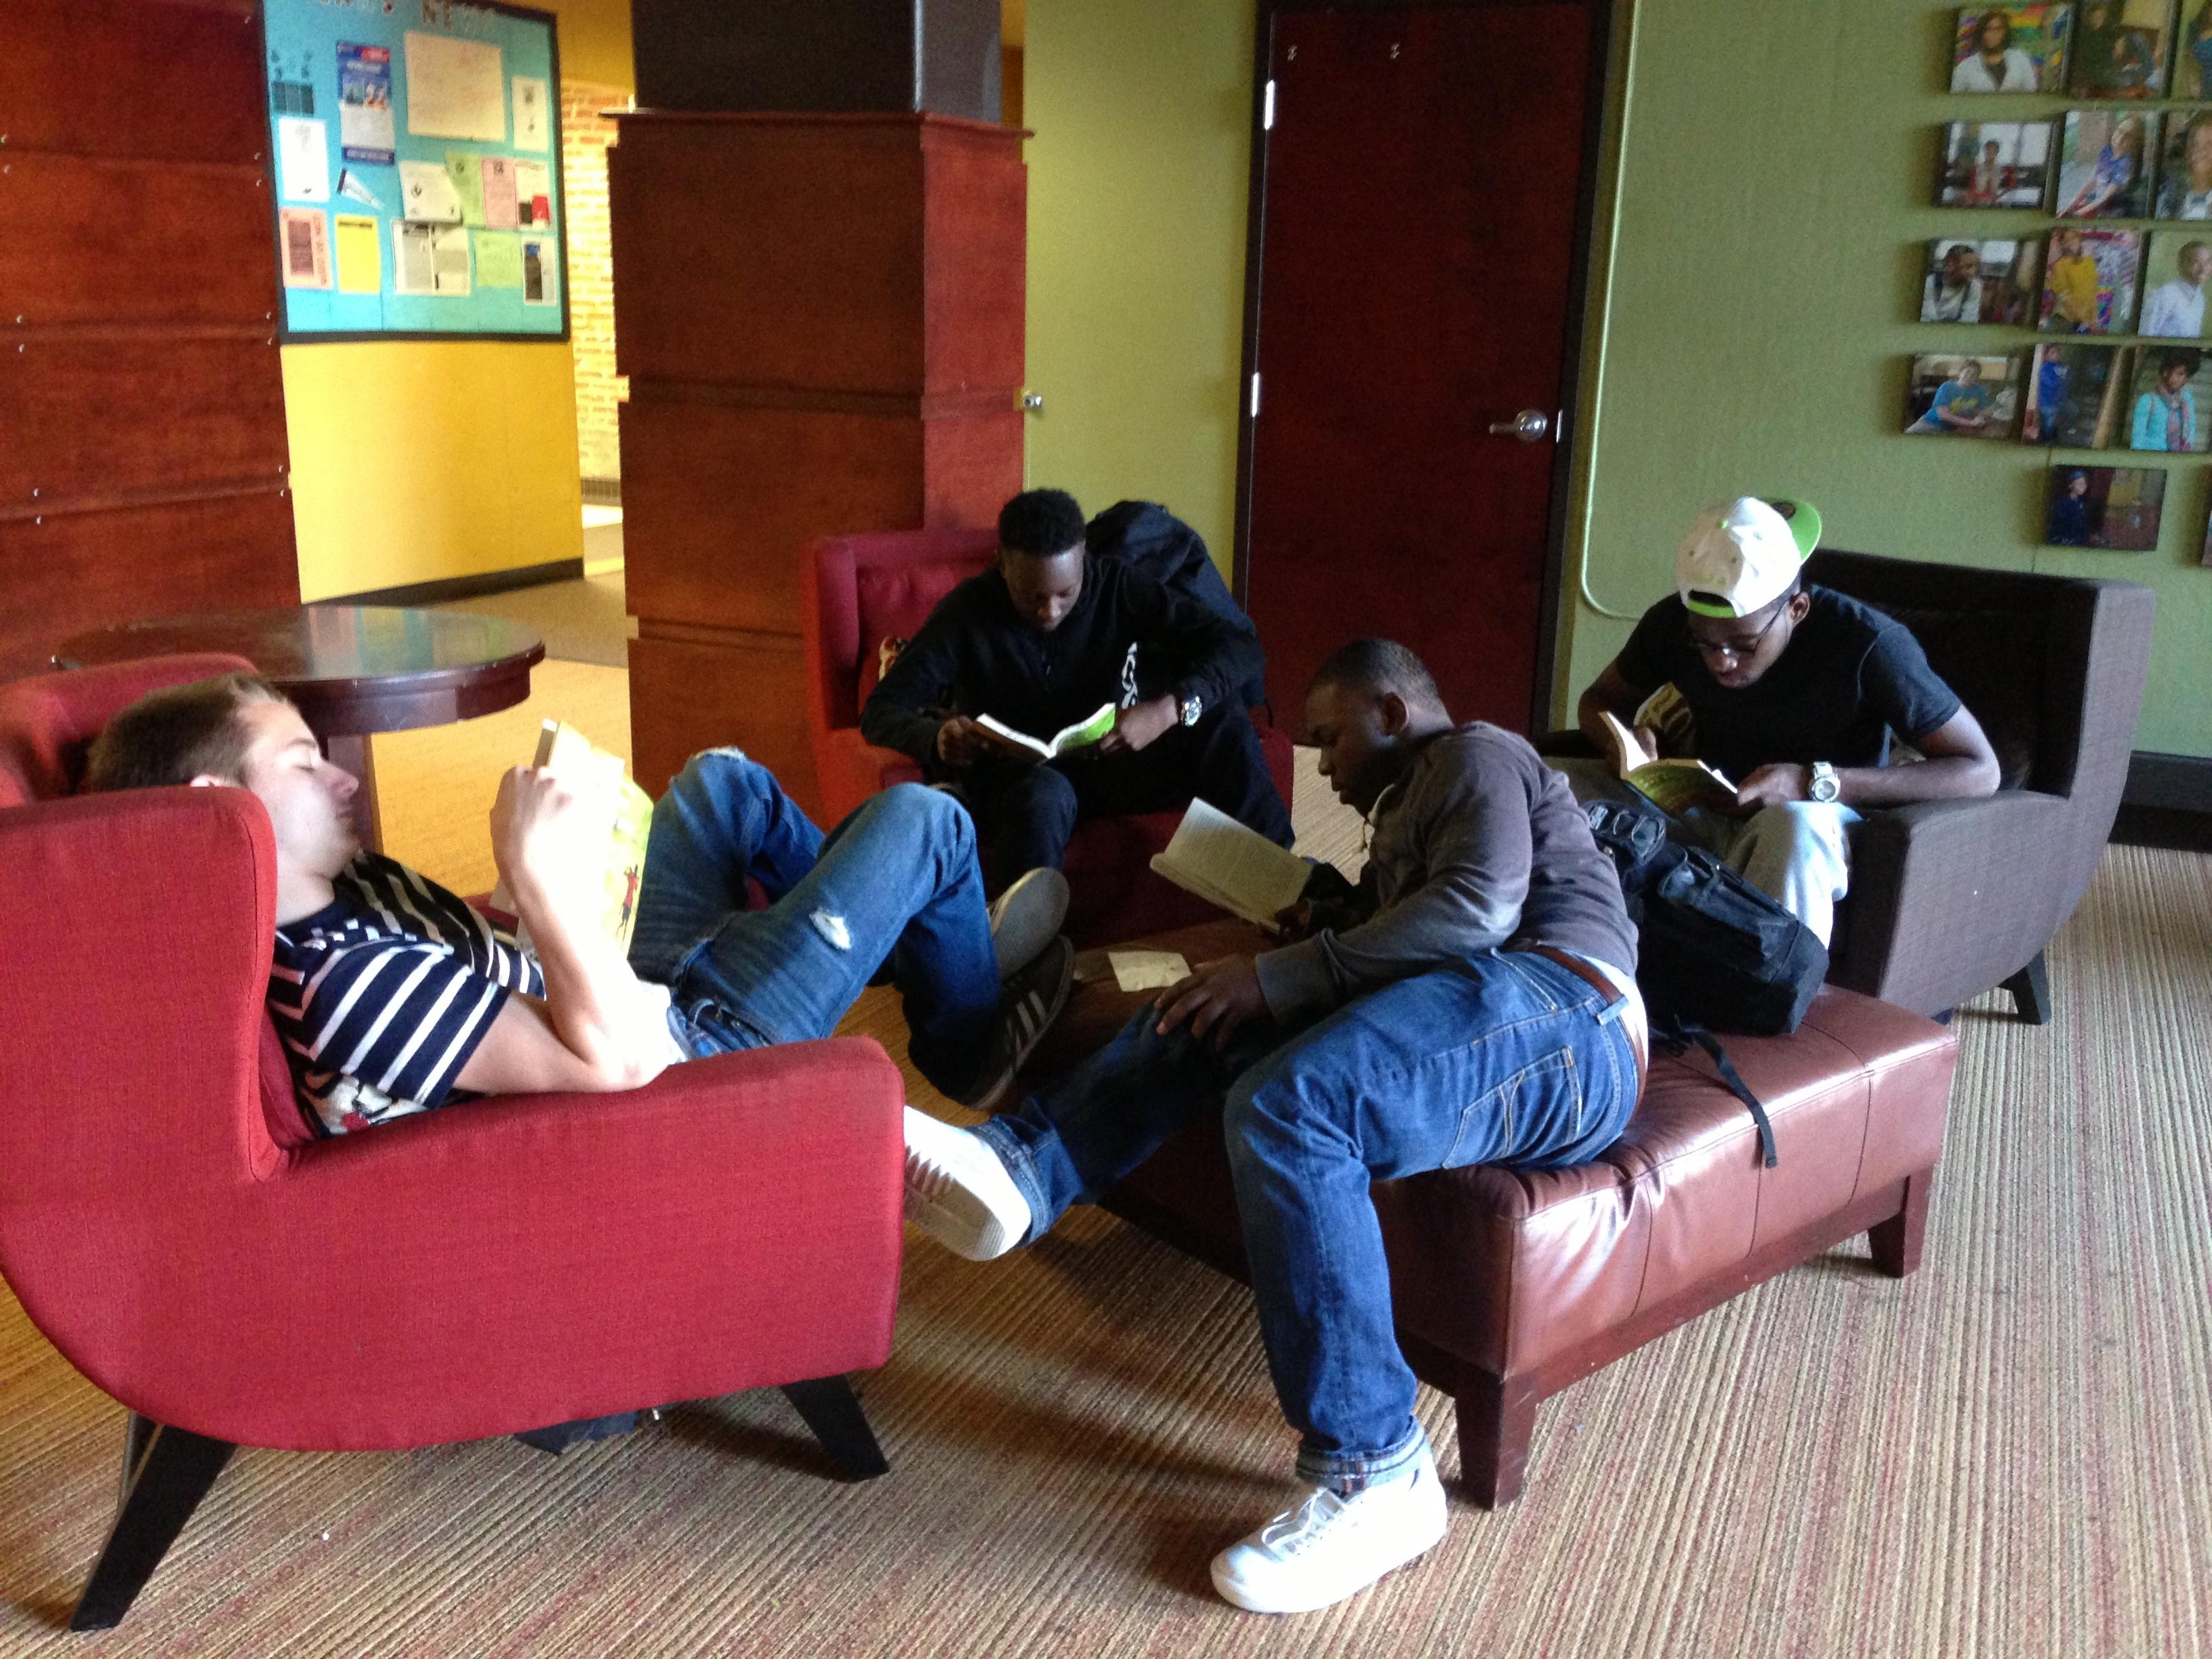 CNHS Lobby and Boys reading.jpg